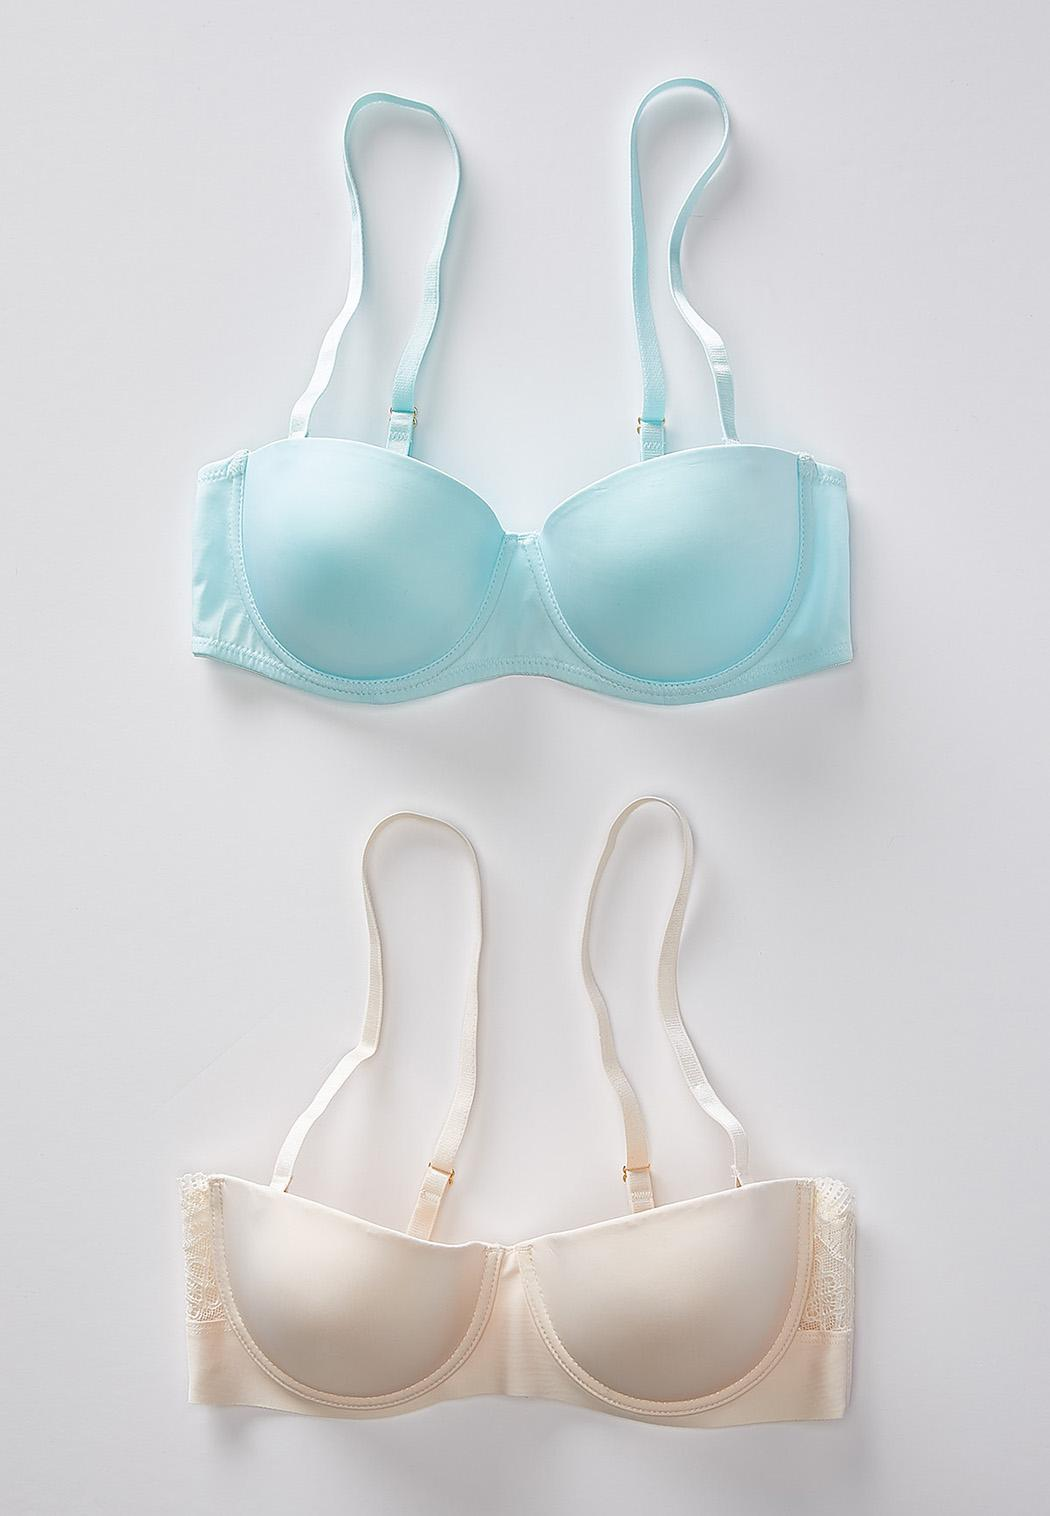 Plus Size Ivory And Aqua Convertible Bra Set